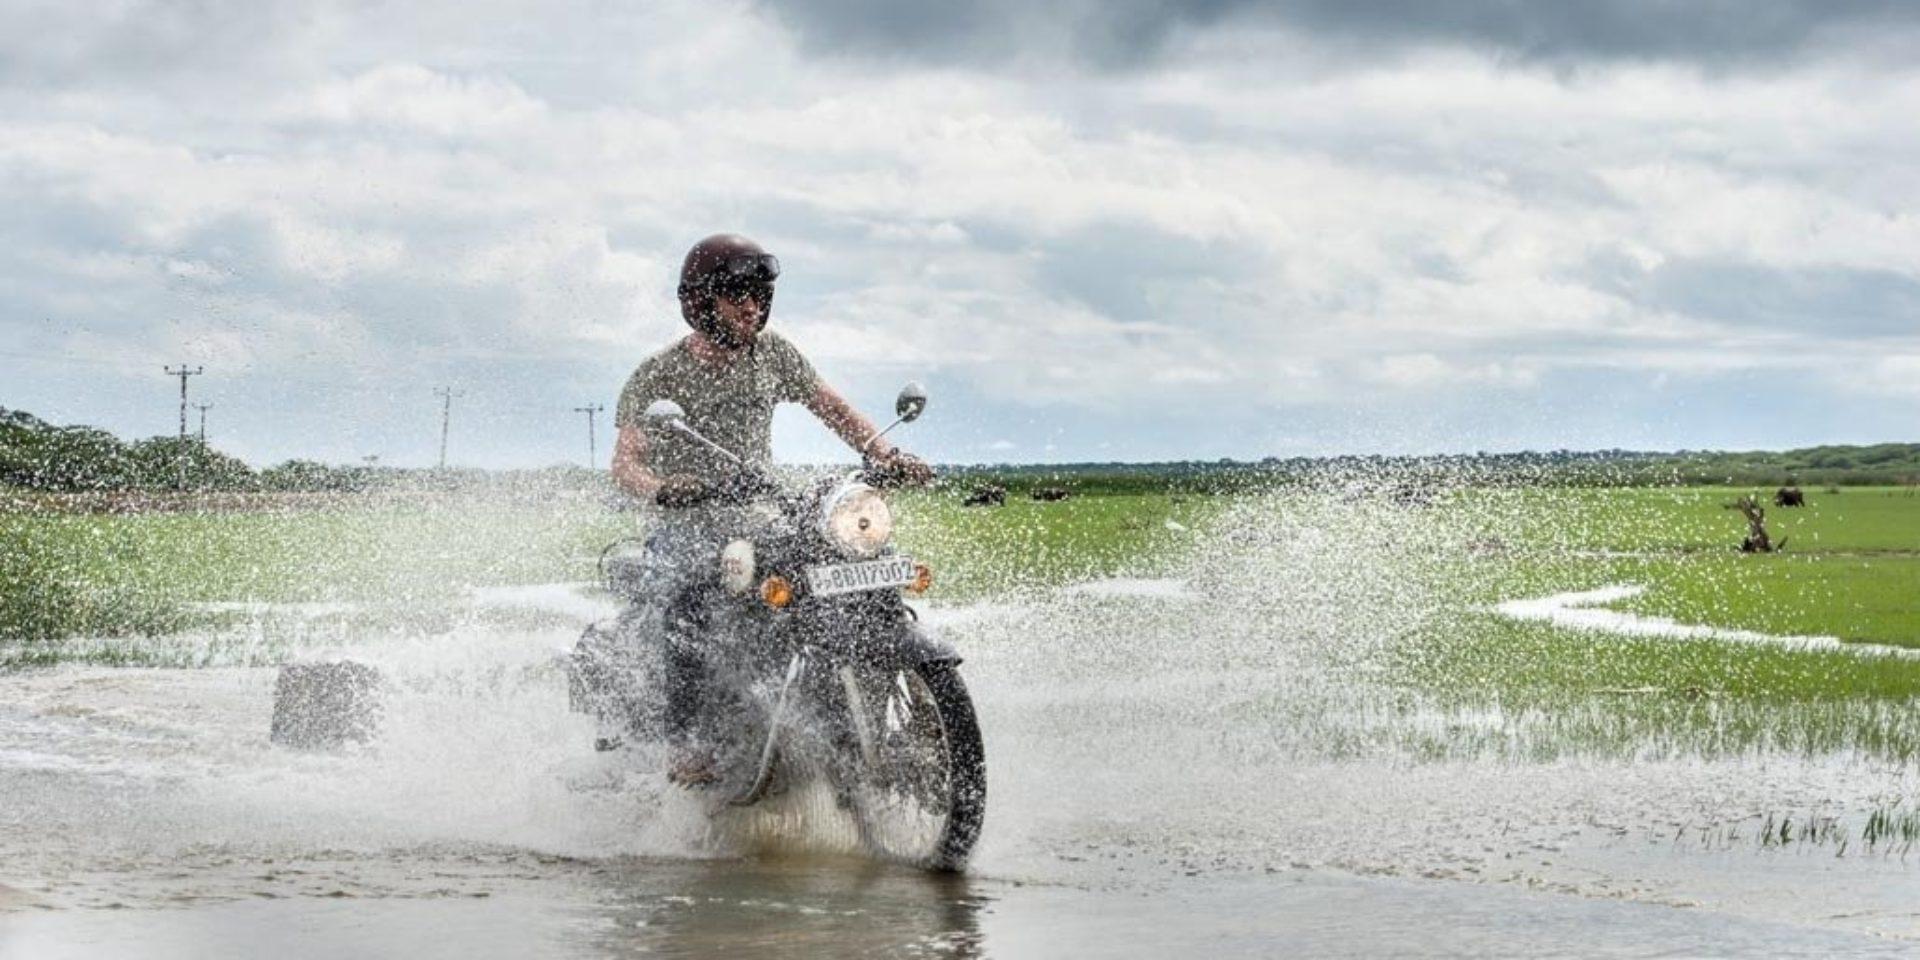 Motorrad-Roadtrip Sri Lanka - Die Highlights von Sri Lanka